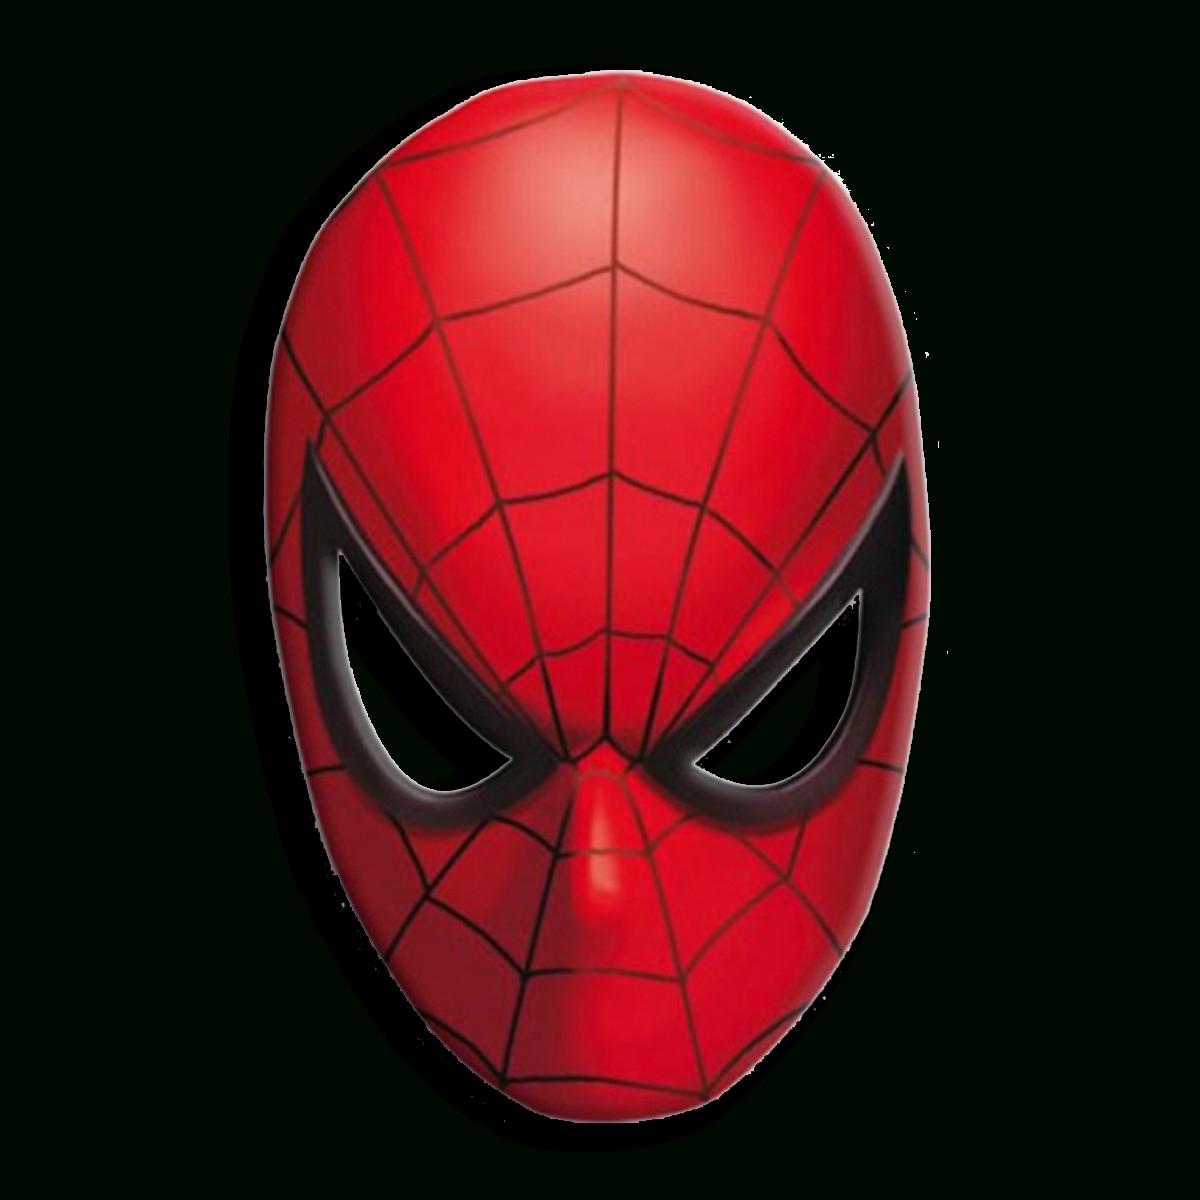 Masque Spiderman Png 4 » Png Image concernant Masque Spiderman A Imprimer